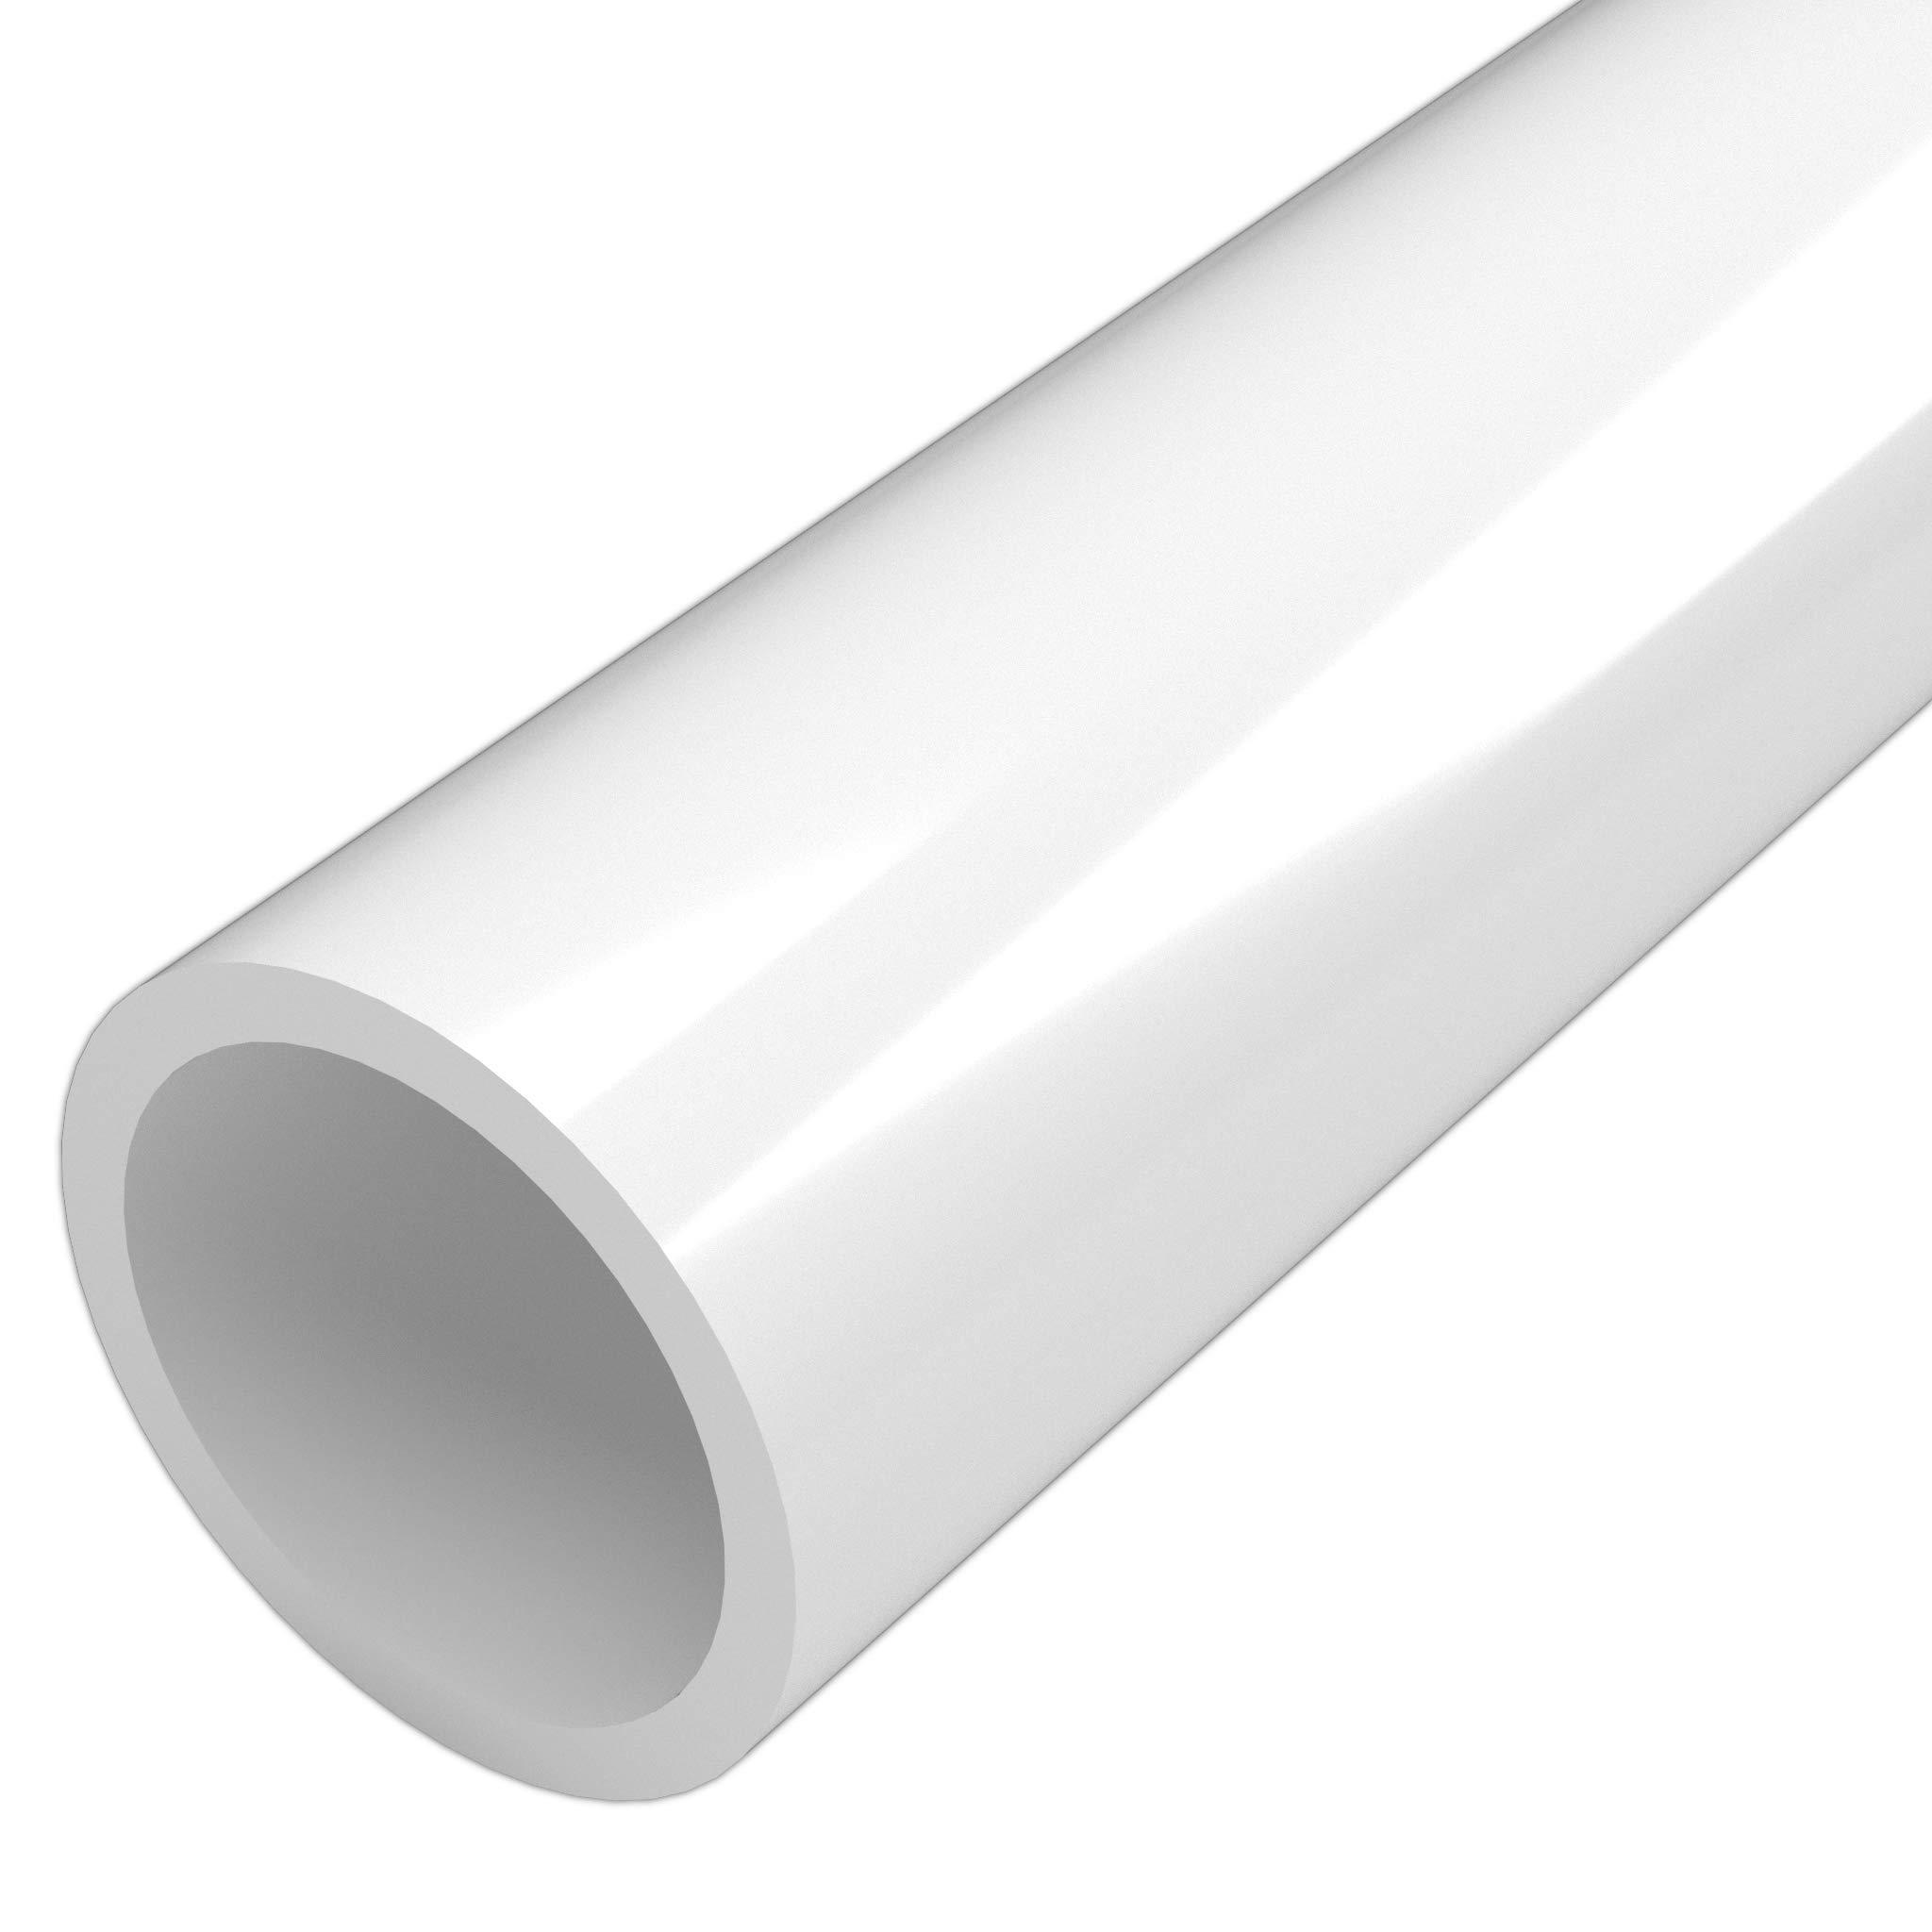 FORMUFIT P112FGP-WH-5 Schedule 40 PVC Pipe, Furniture Grade, 5', 1-1/2'' Size, White